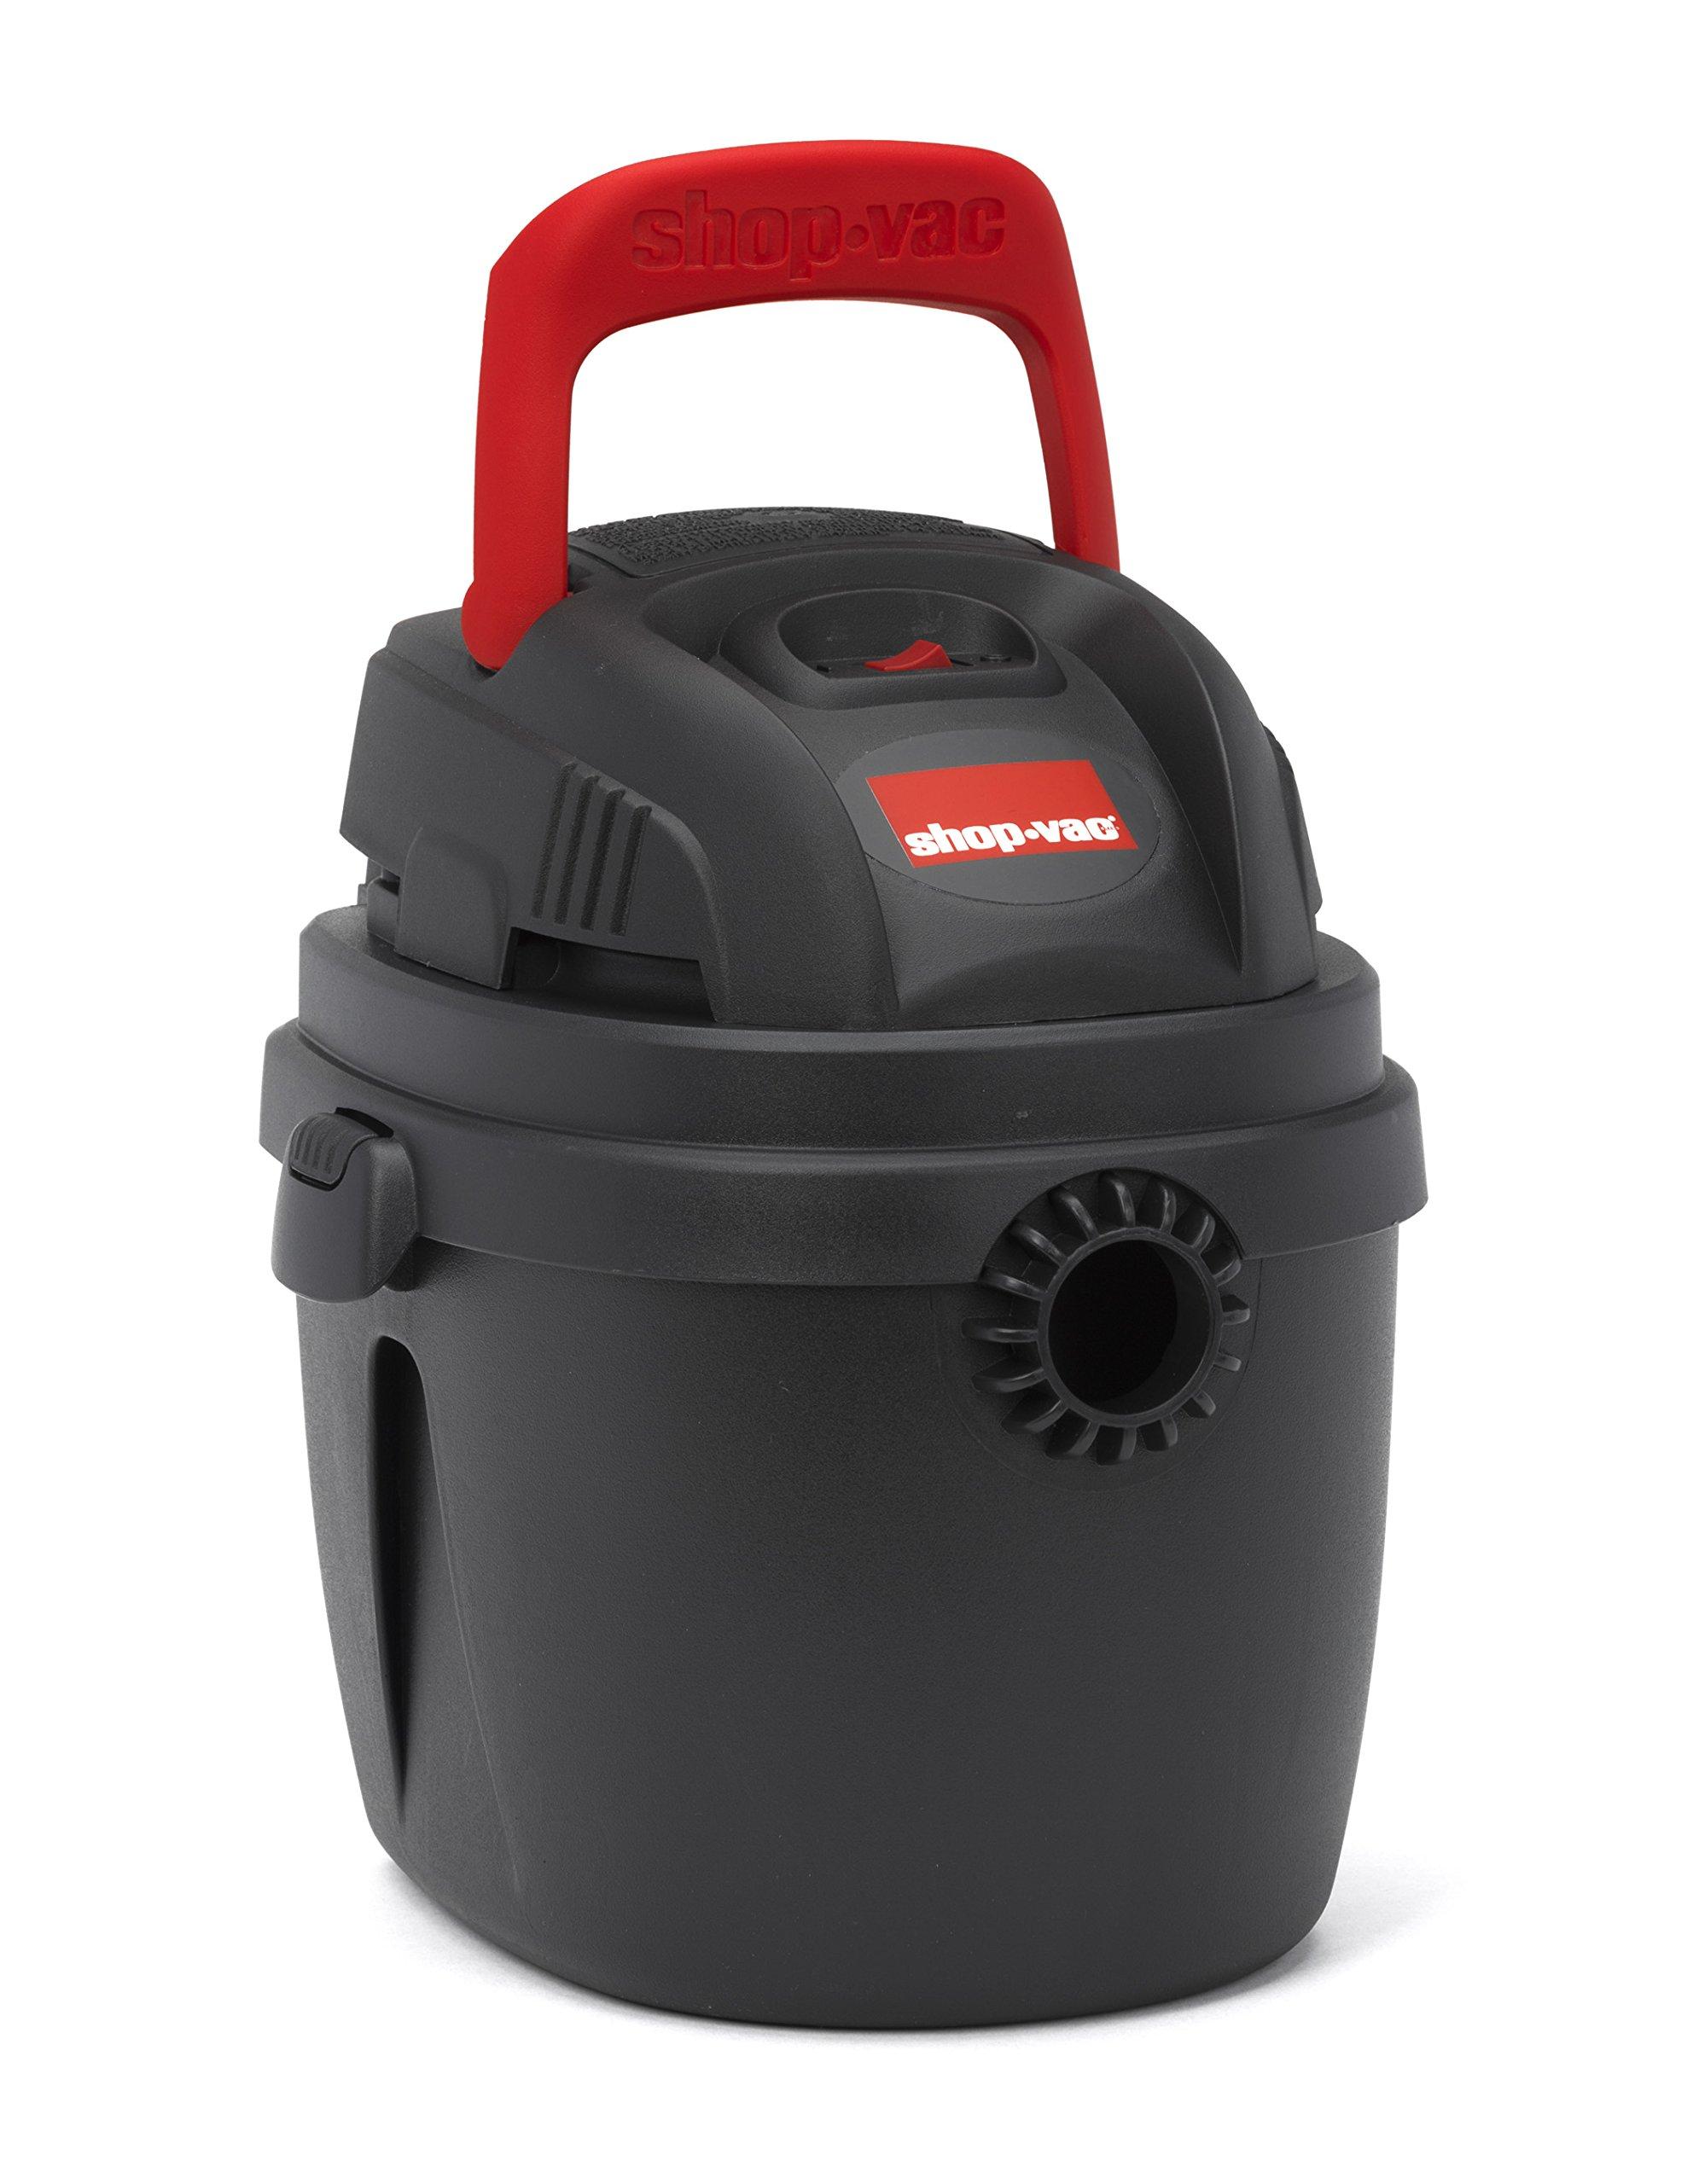 Shop-Vac 2030227 1.5 gallon 2.0 Peak hp Portable Wet Dry Vac, Red/Black